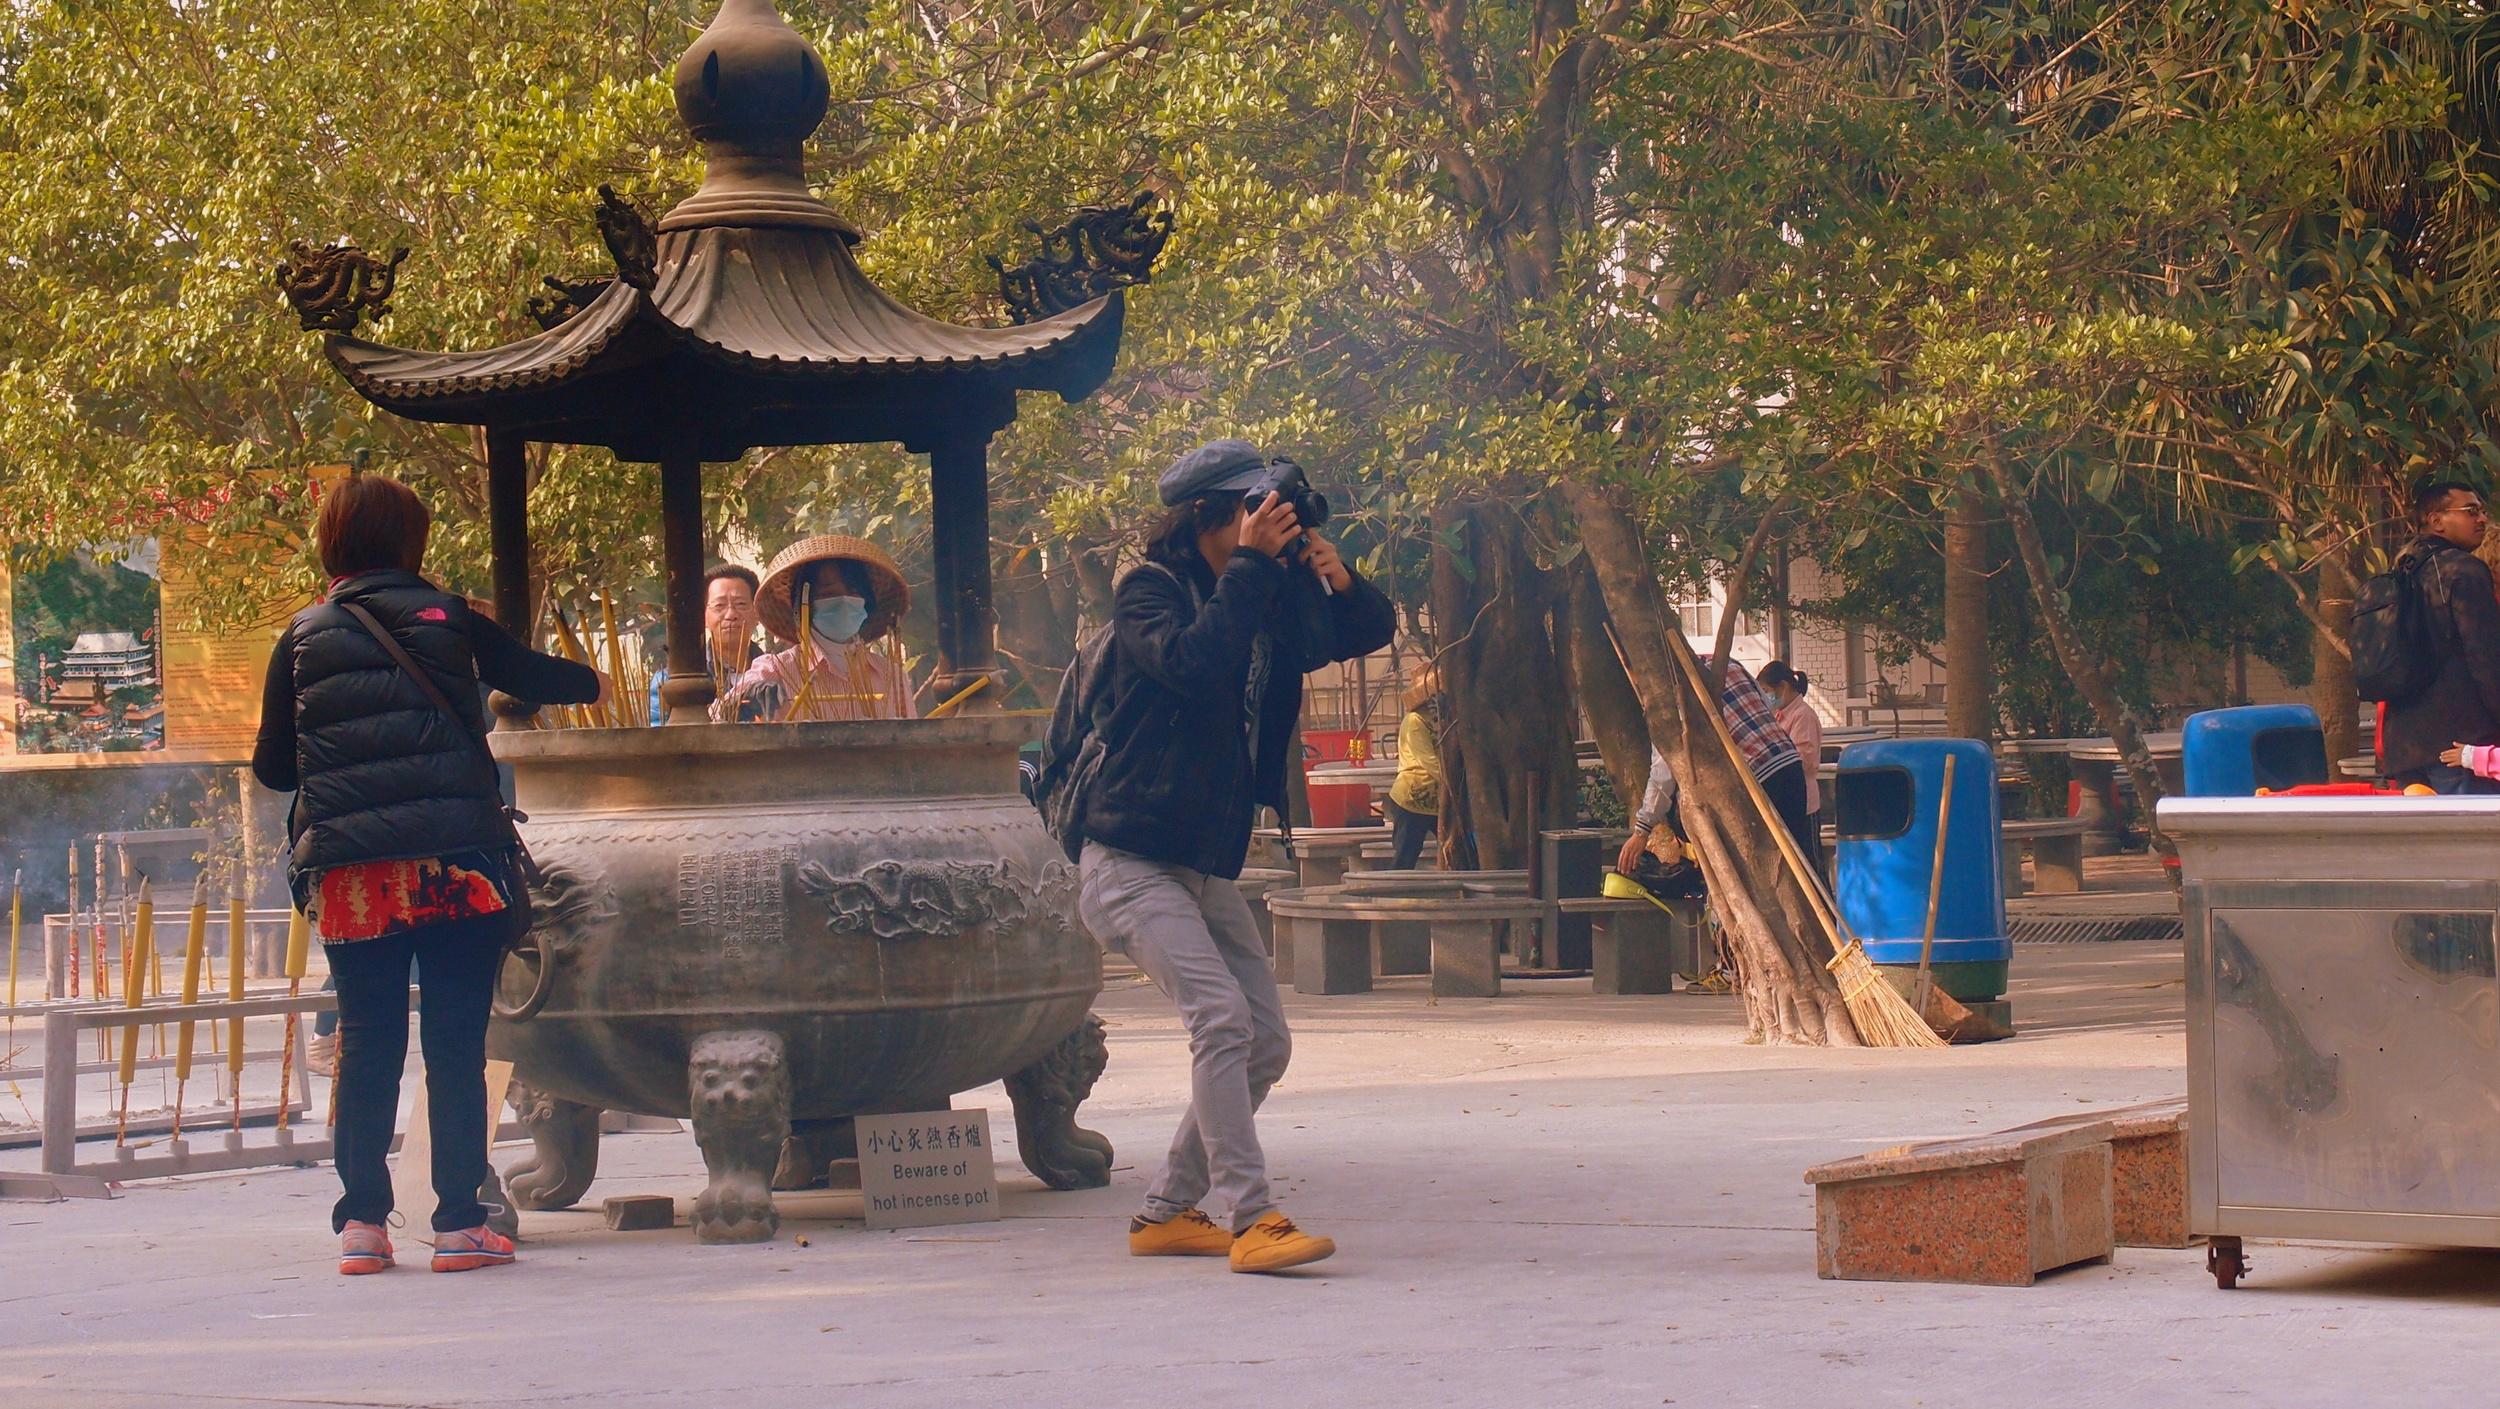 The iconic photographers pose - the Po Lin Monastery next to the Giant Buddha on Lantau Island